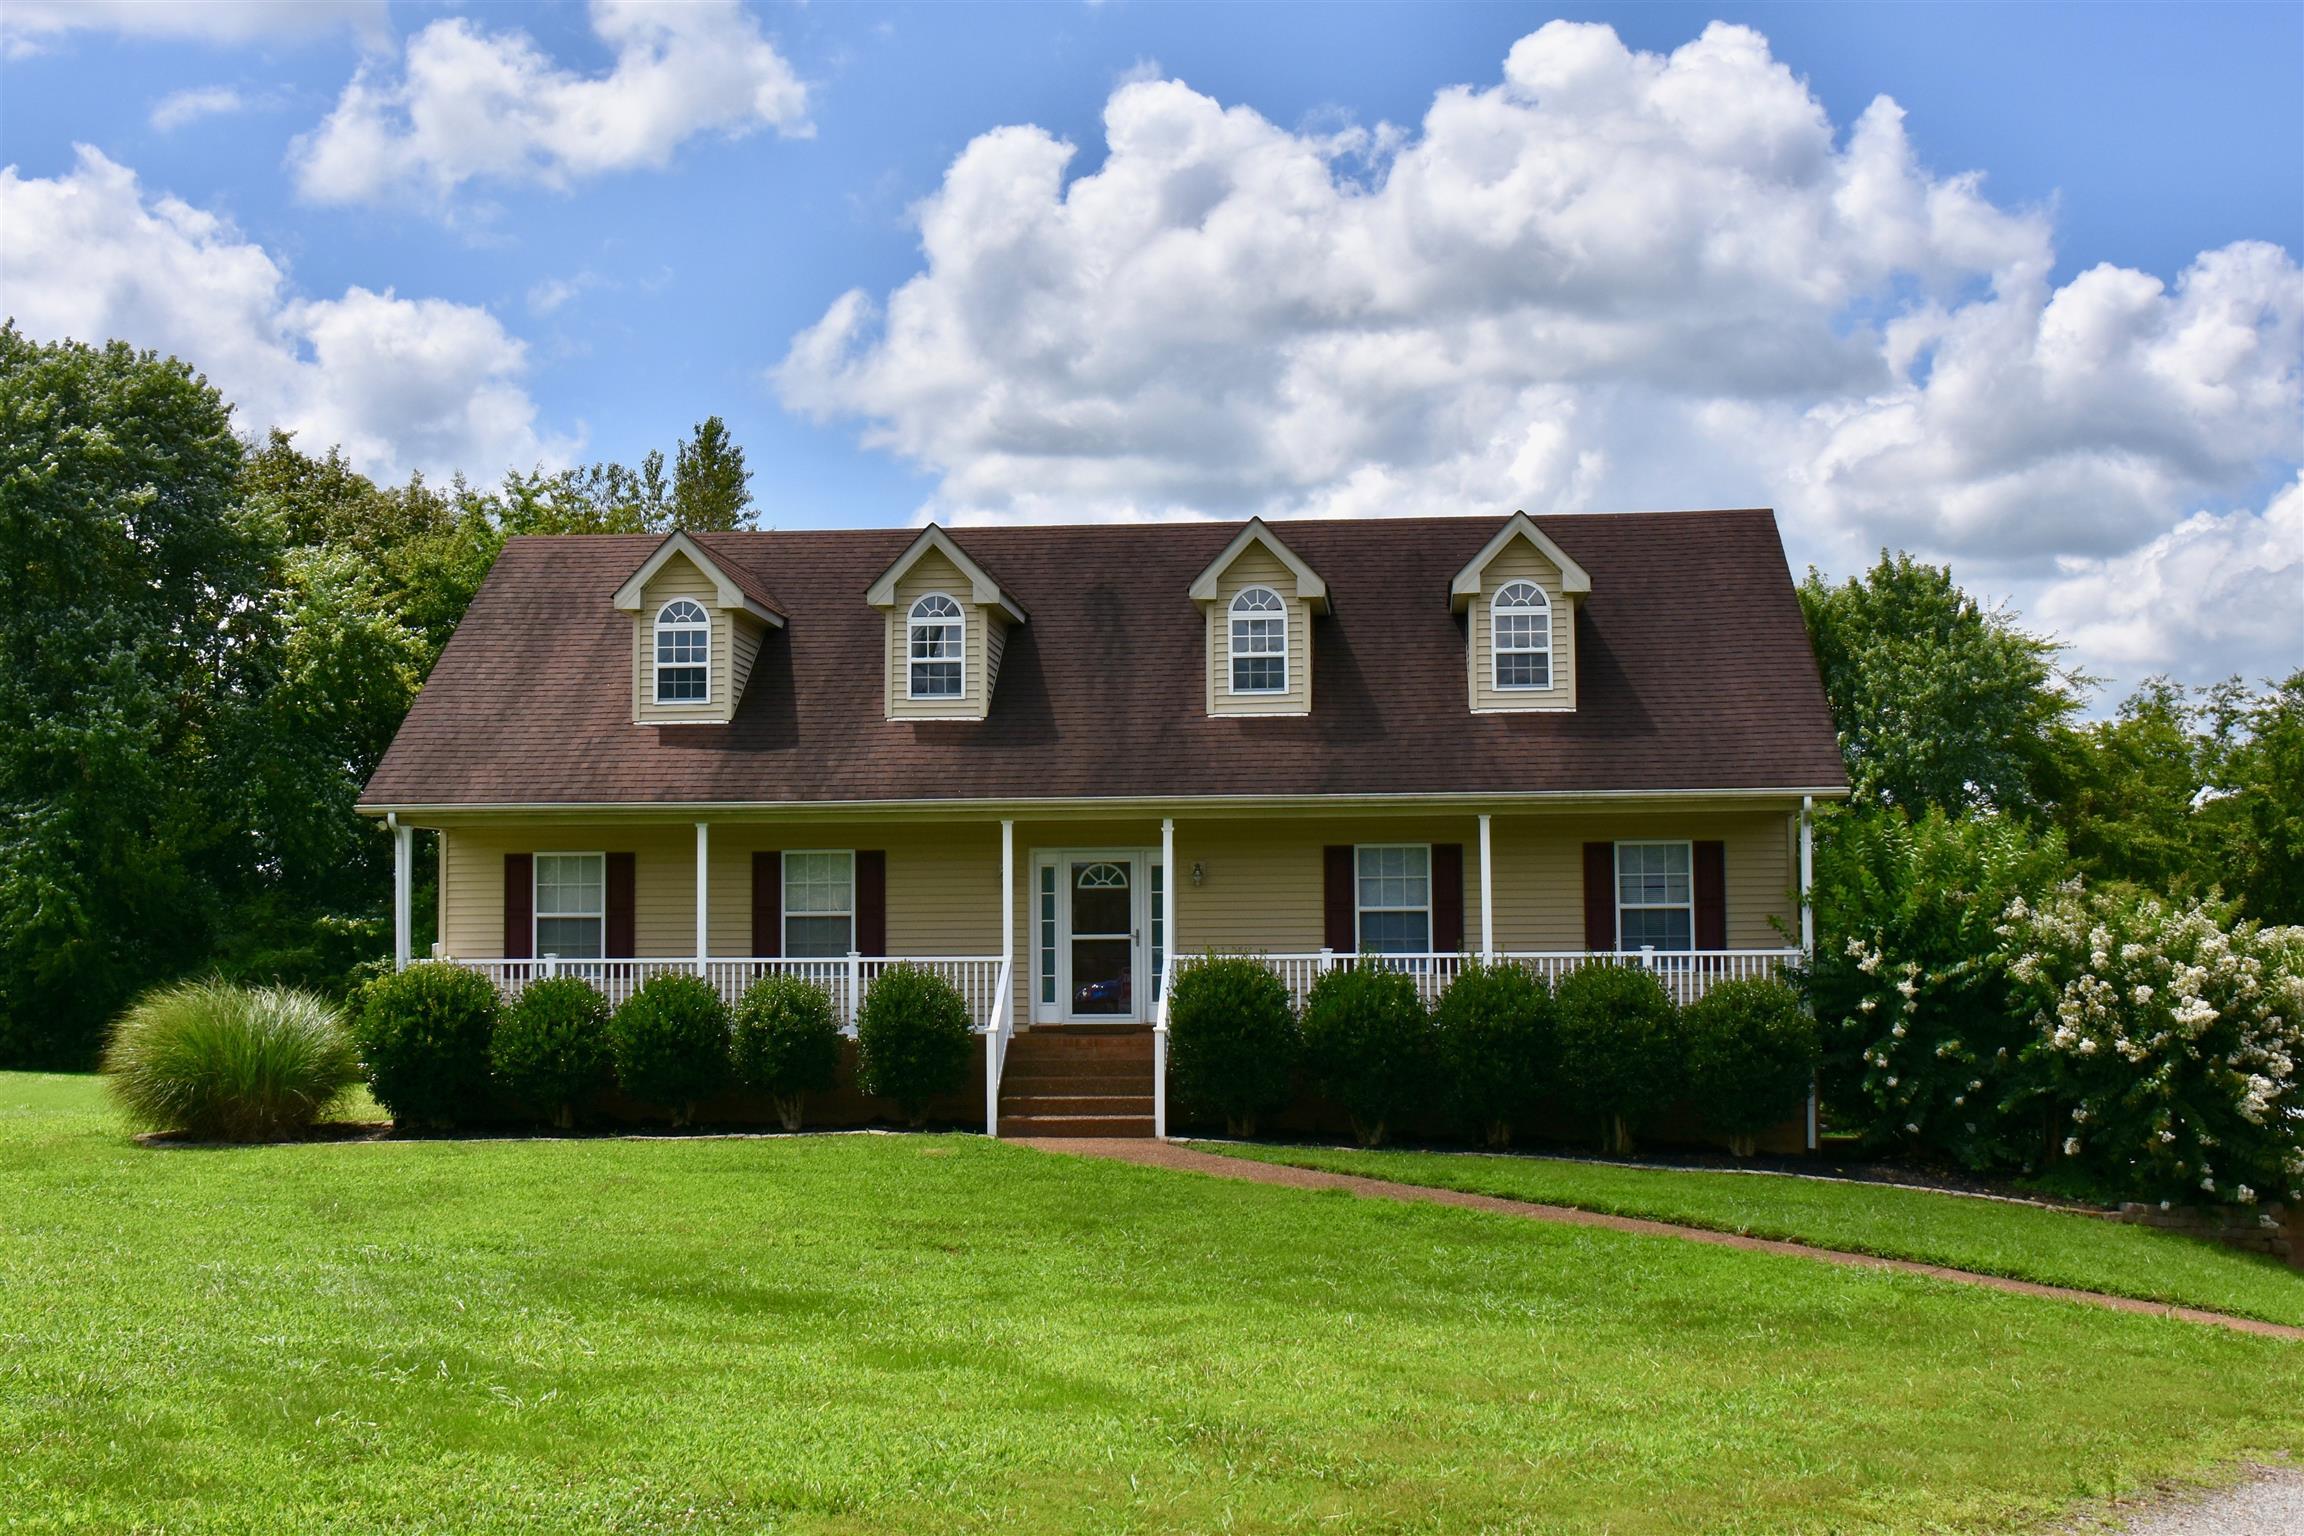 1035 Marilee Ct, Orlinda, TN 37141 - Orlinda, TN real estate listing